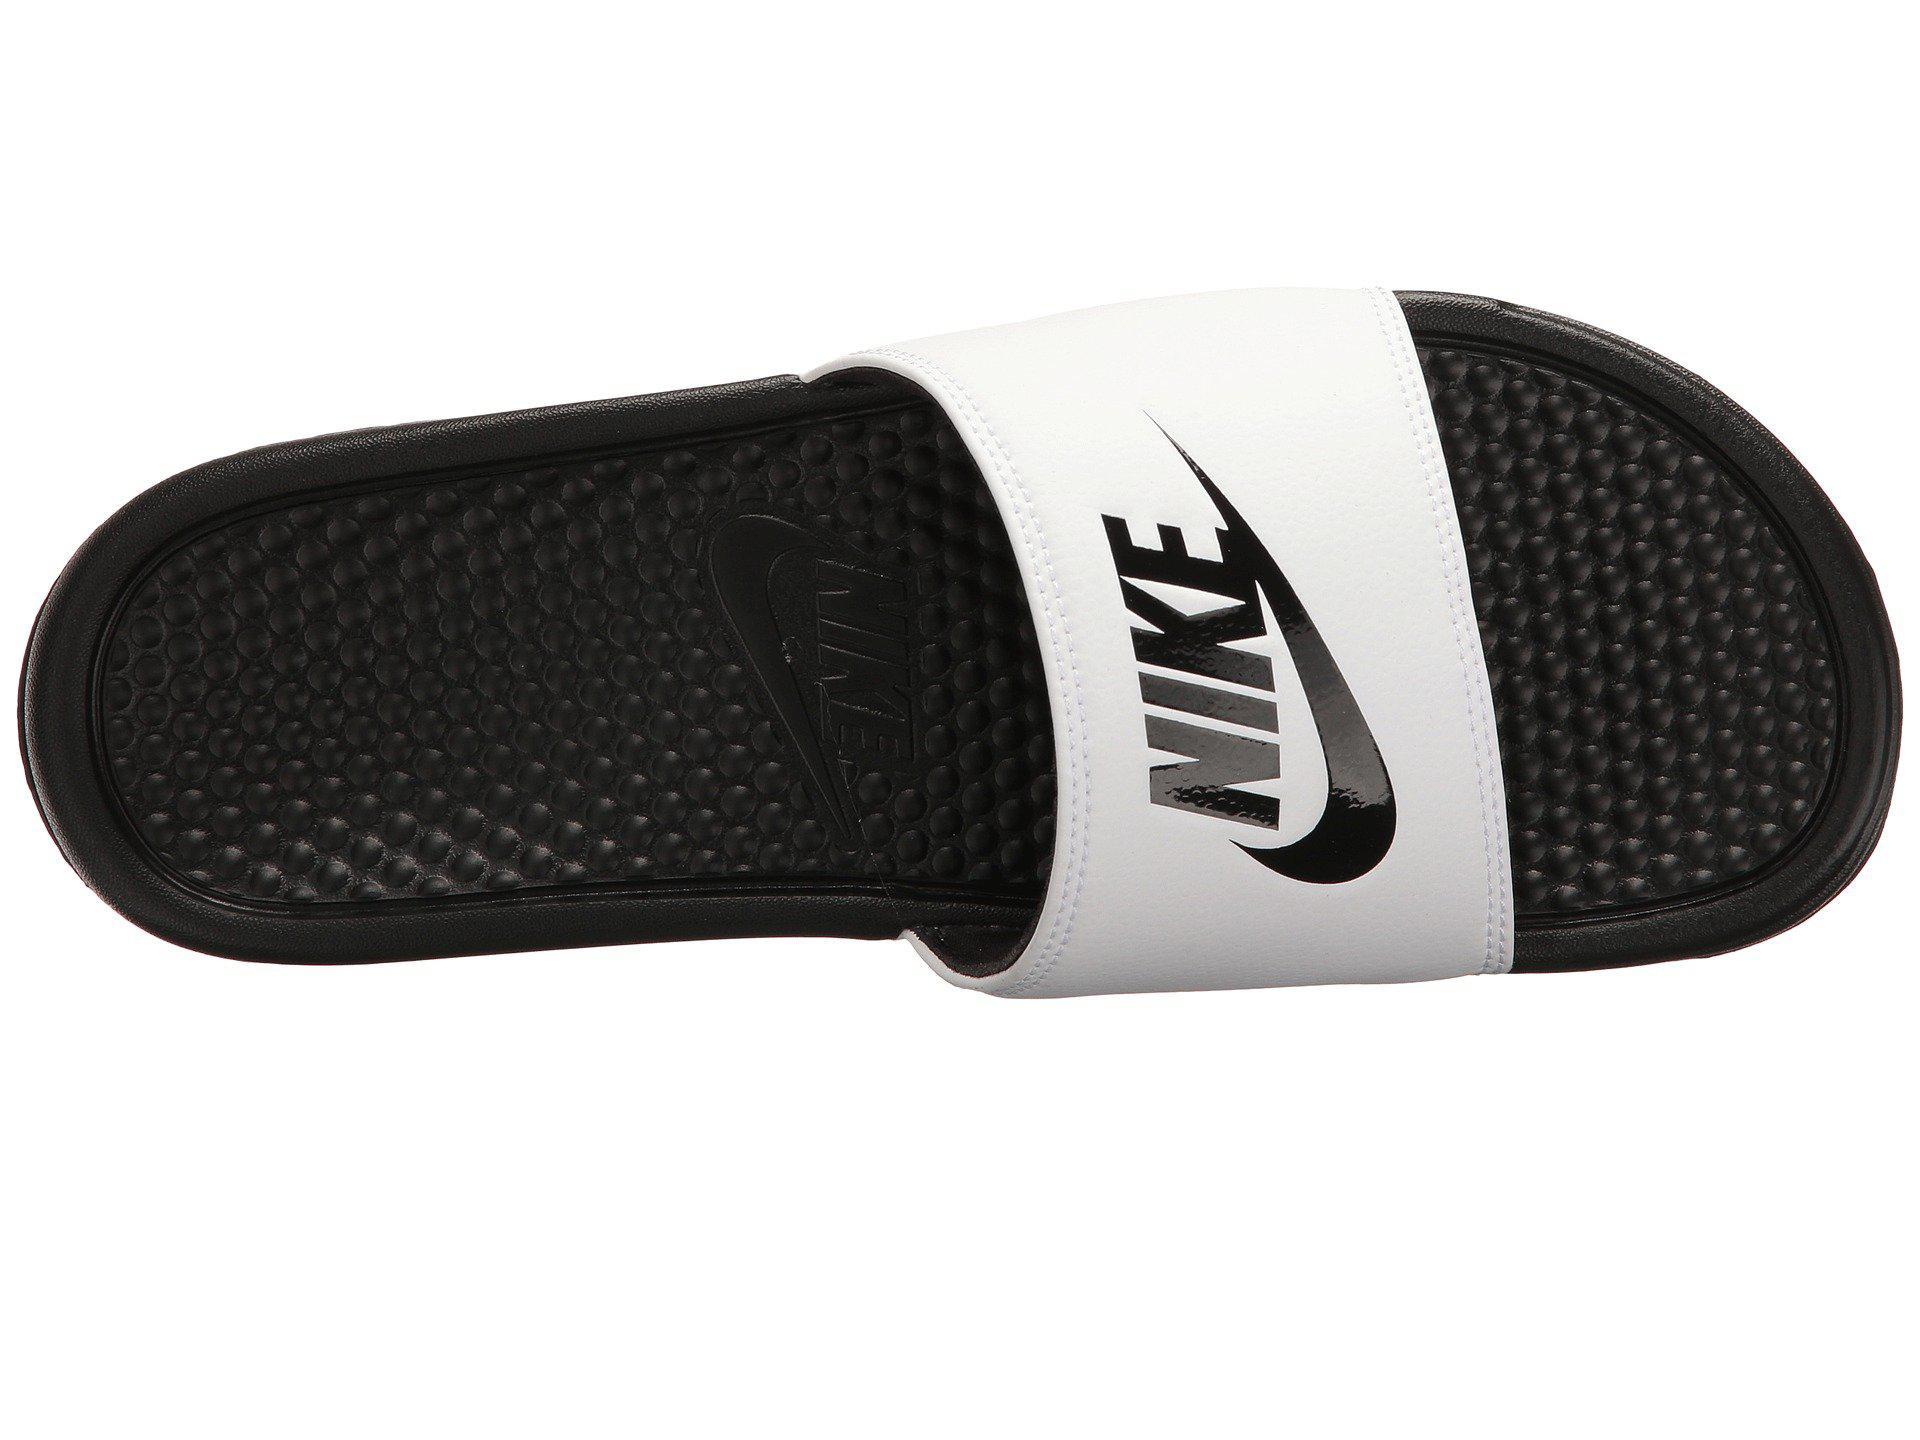 4dc94fa807af Nike - Benassi Jdi Slide (black white) Men s Slide Shoes for Men -. View  fullscreen